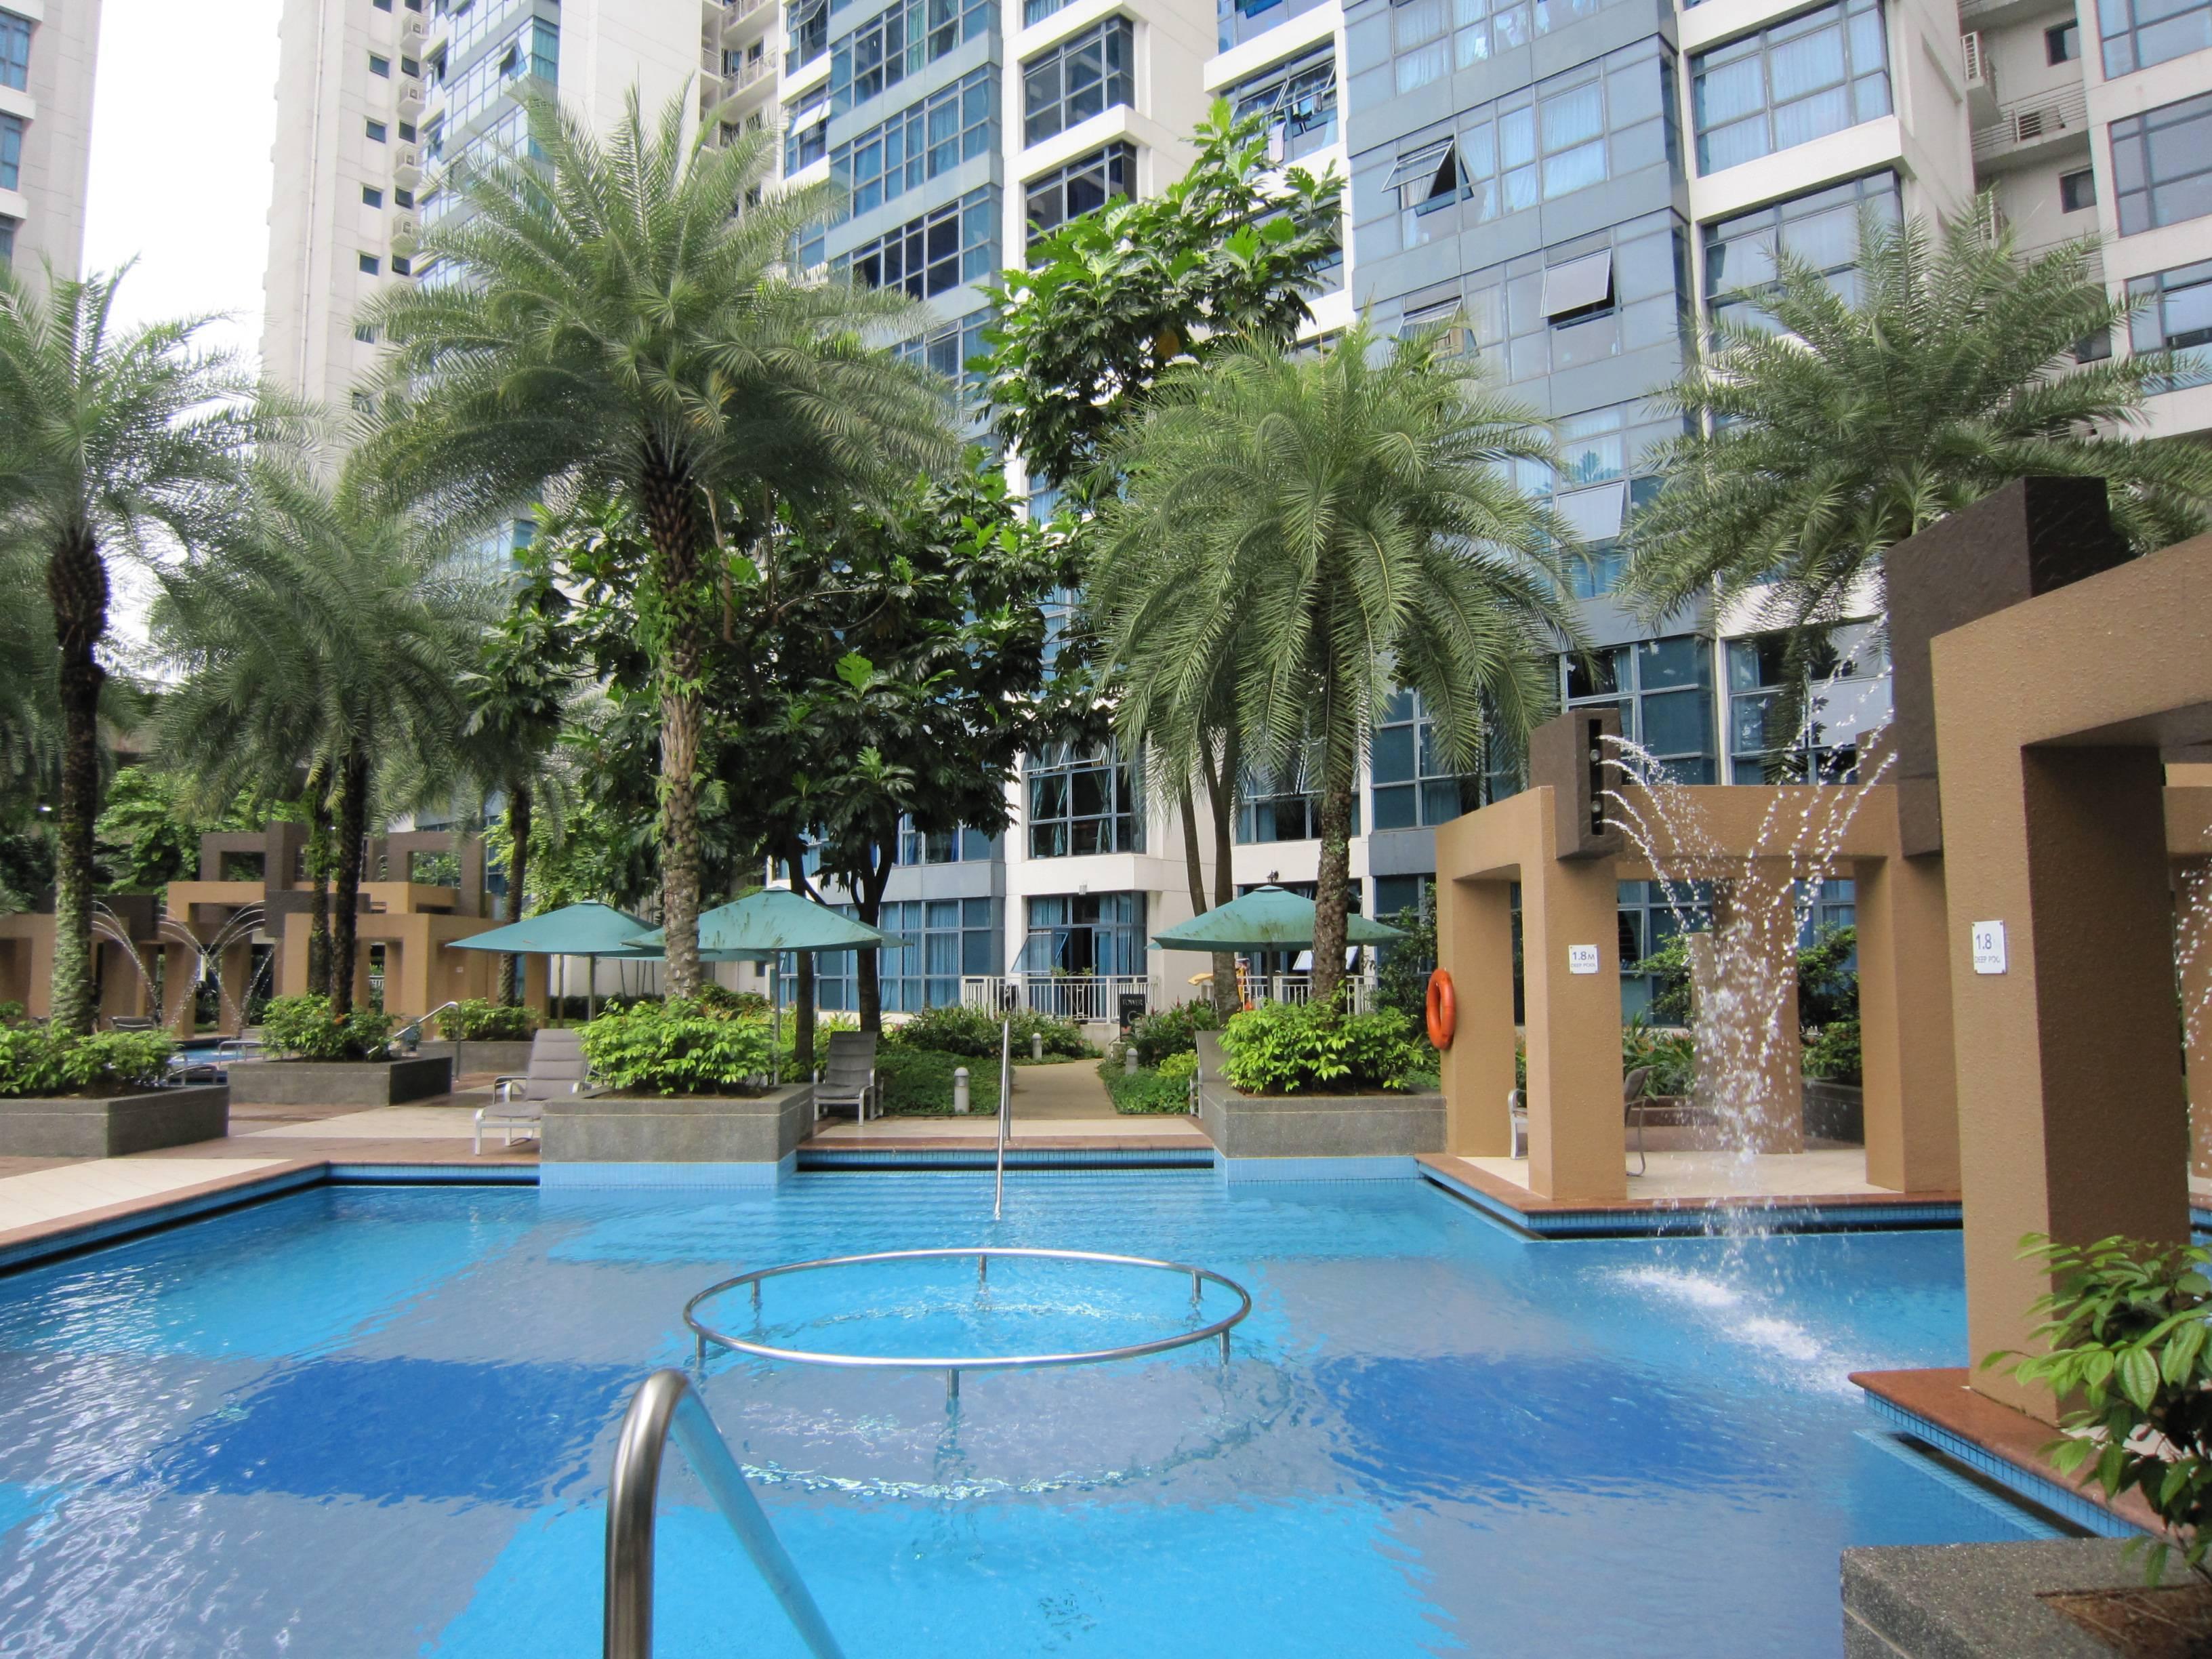 Condo For Rent Clementi Clementi Singapore West Coast Blue Horizon Condo 3 Bedrooms Near